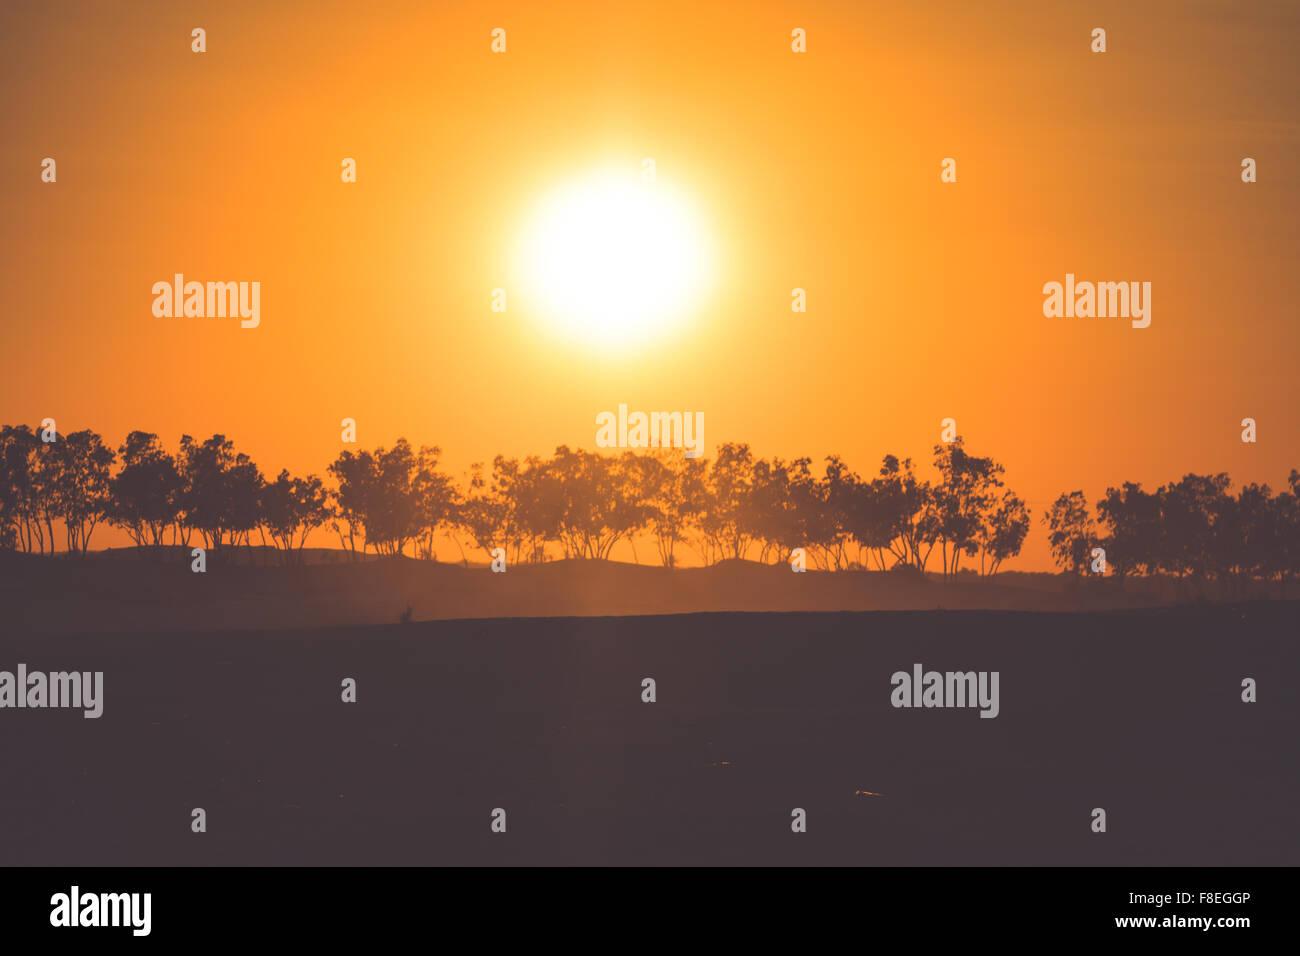 Sunset in the Sahara desert - Douz, Tunisia. - Stock Image